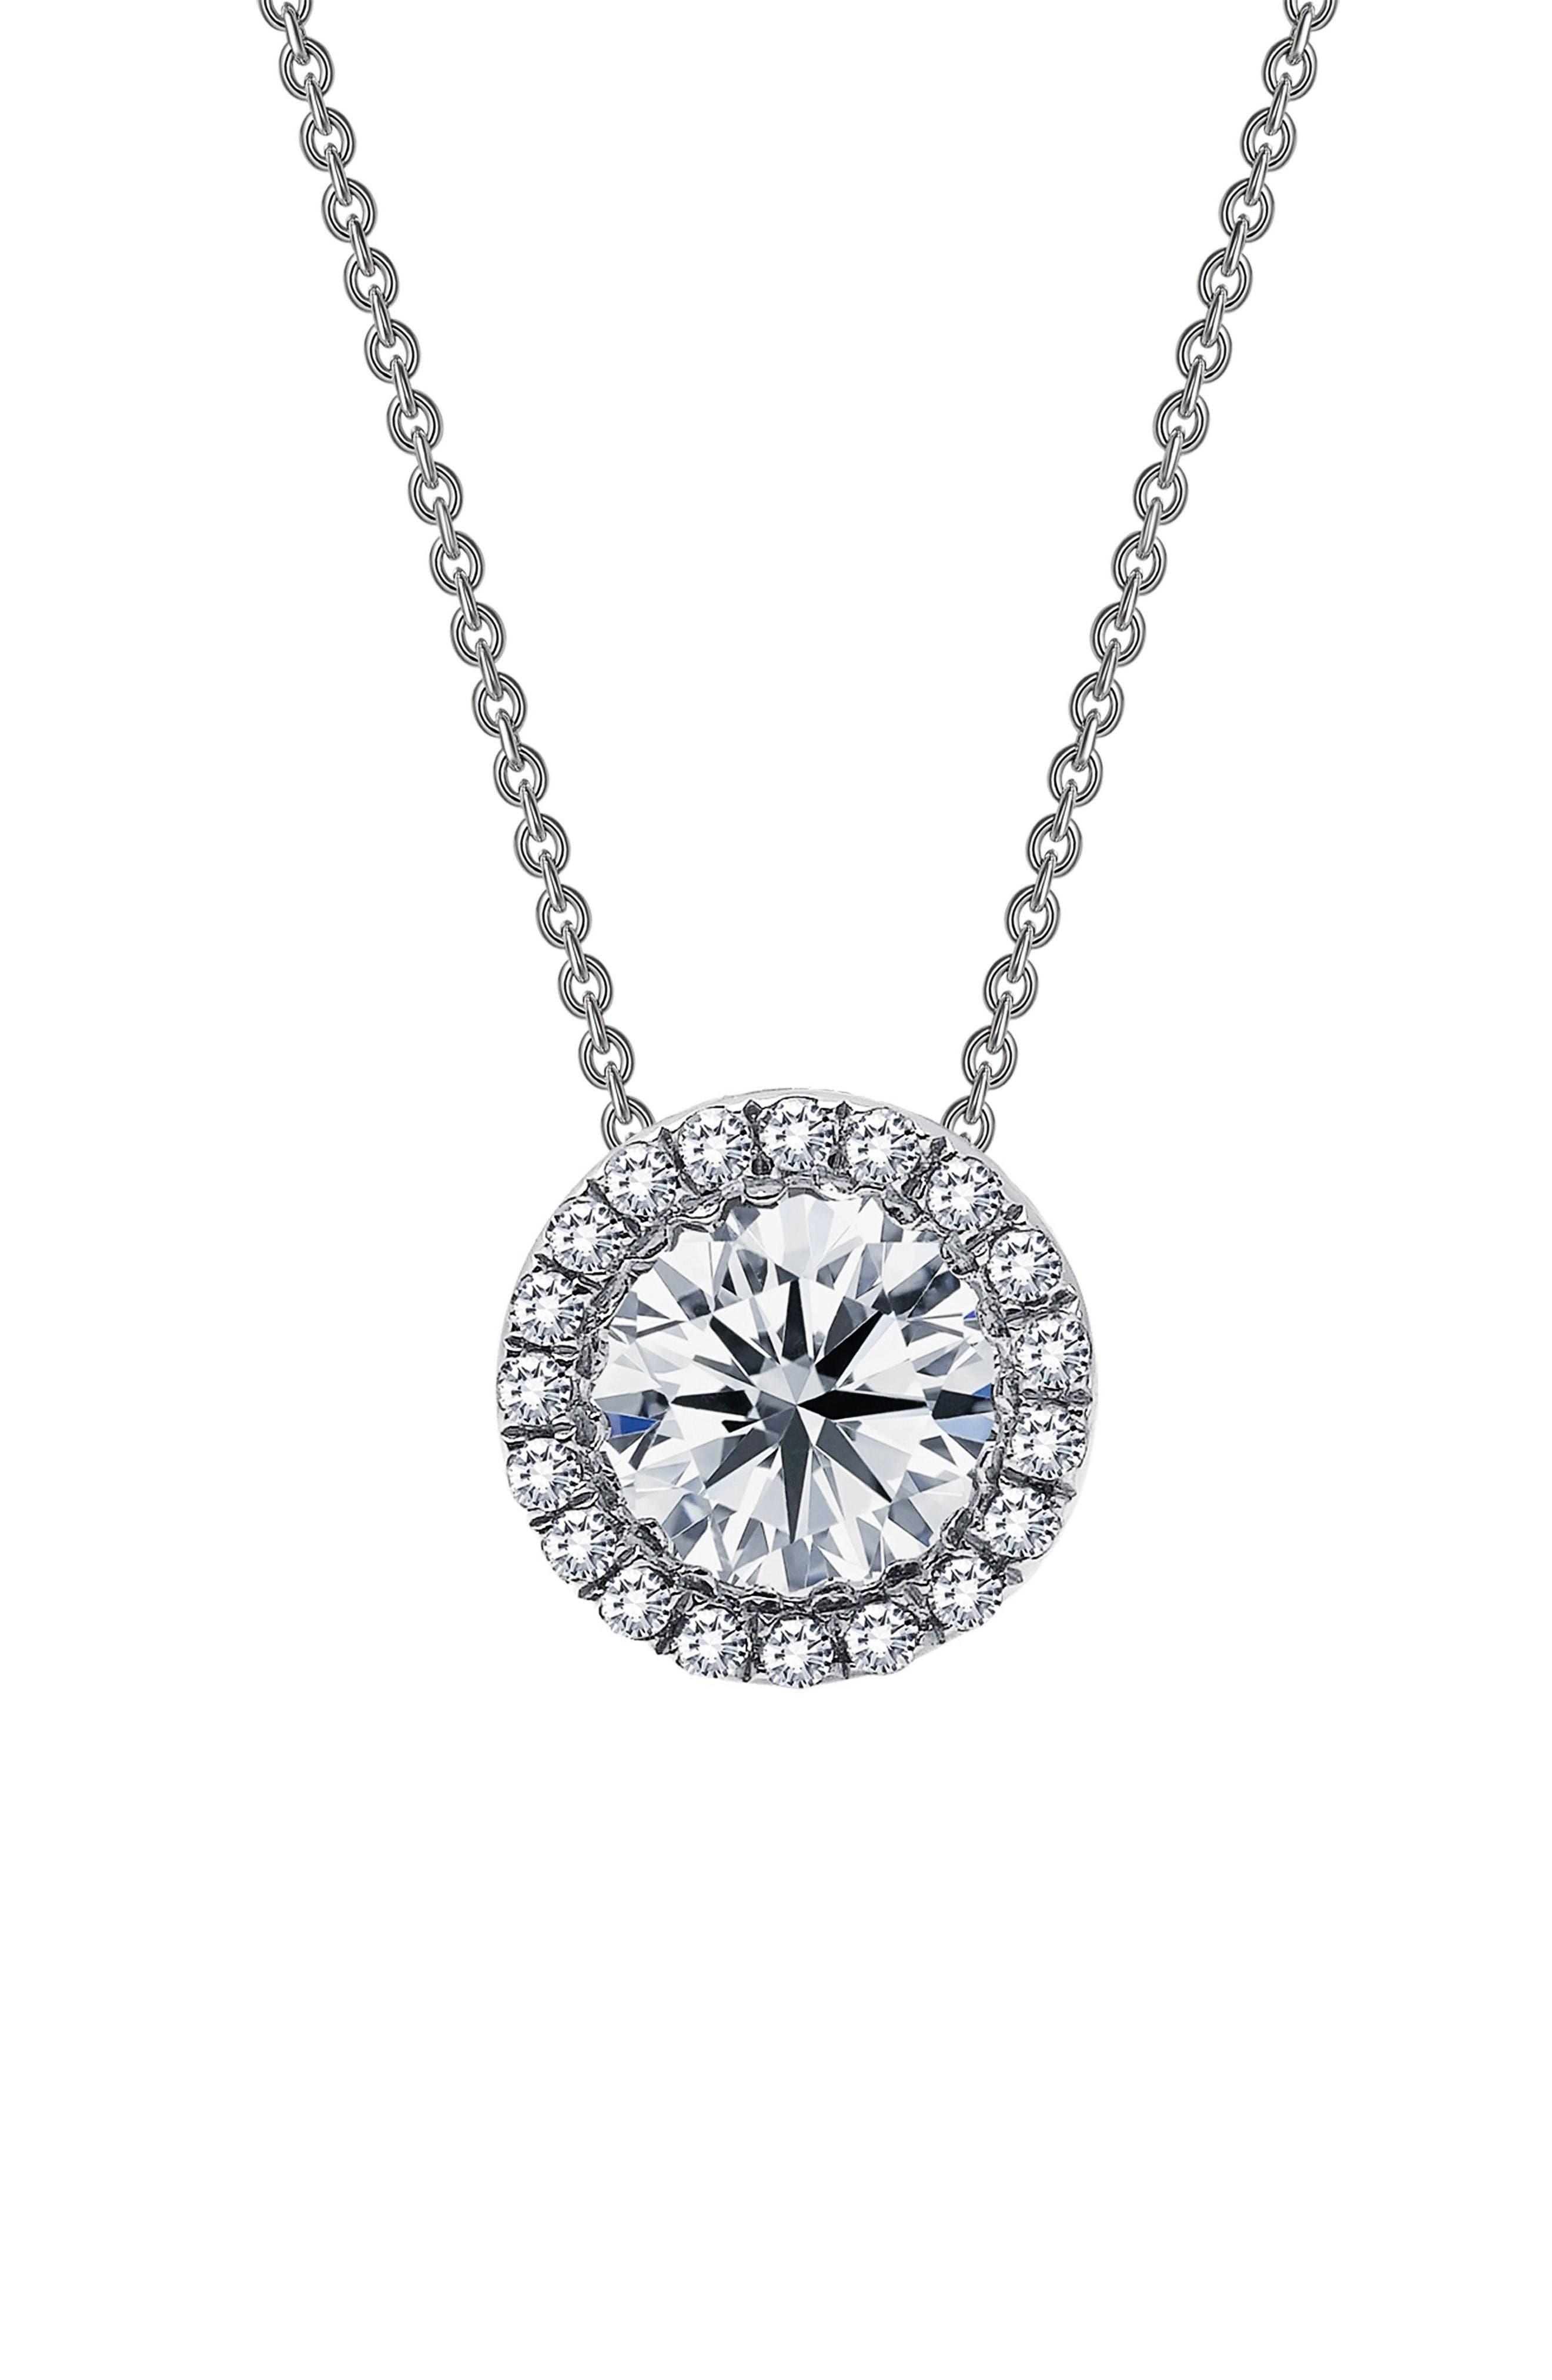 Simulated Diamond Pendant Necklace,                         Main,                         color, Silver